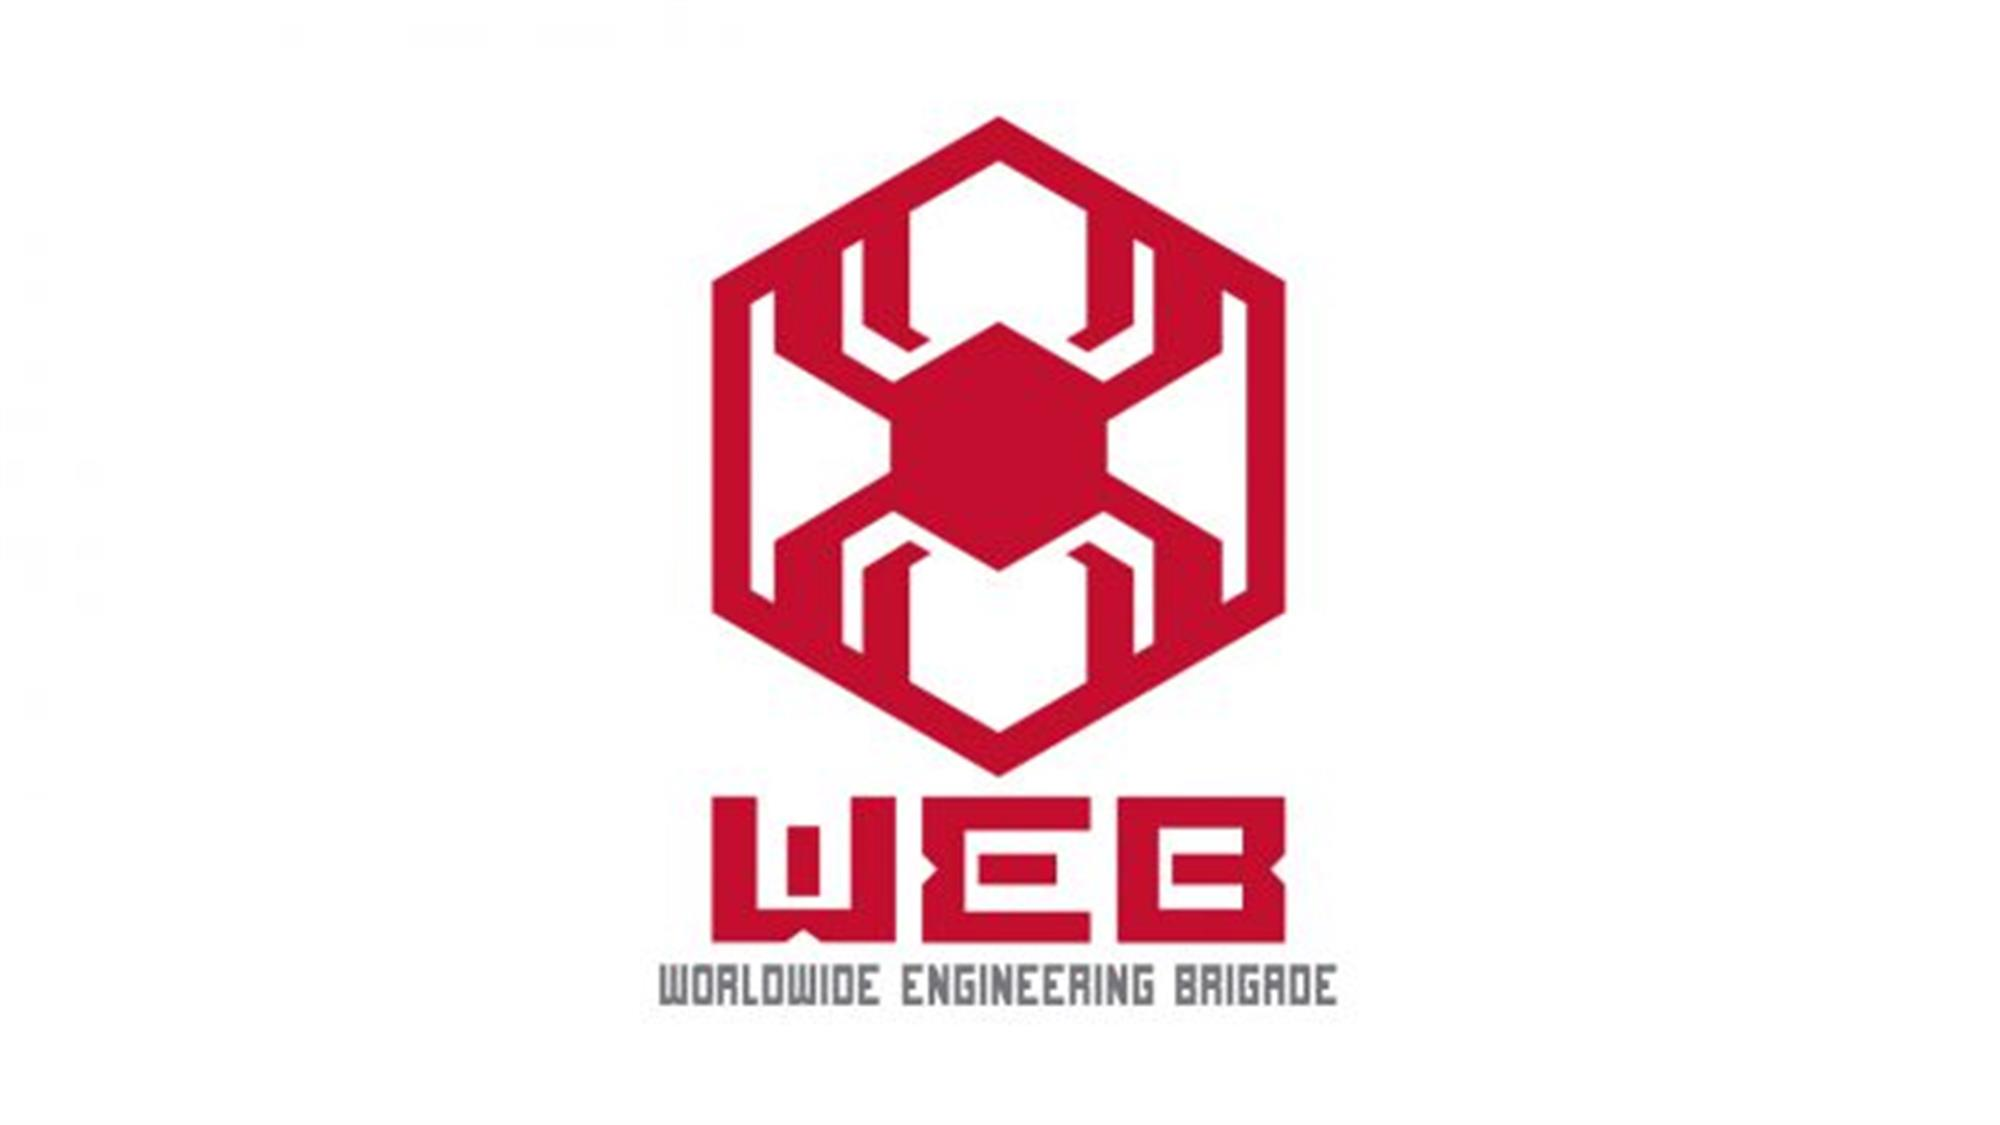 Worldwide Engineering Brigade Logo